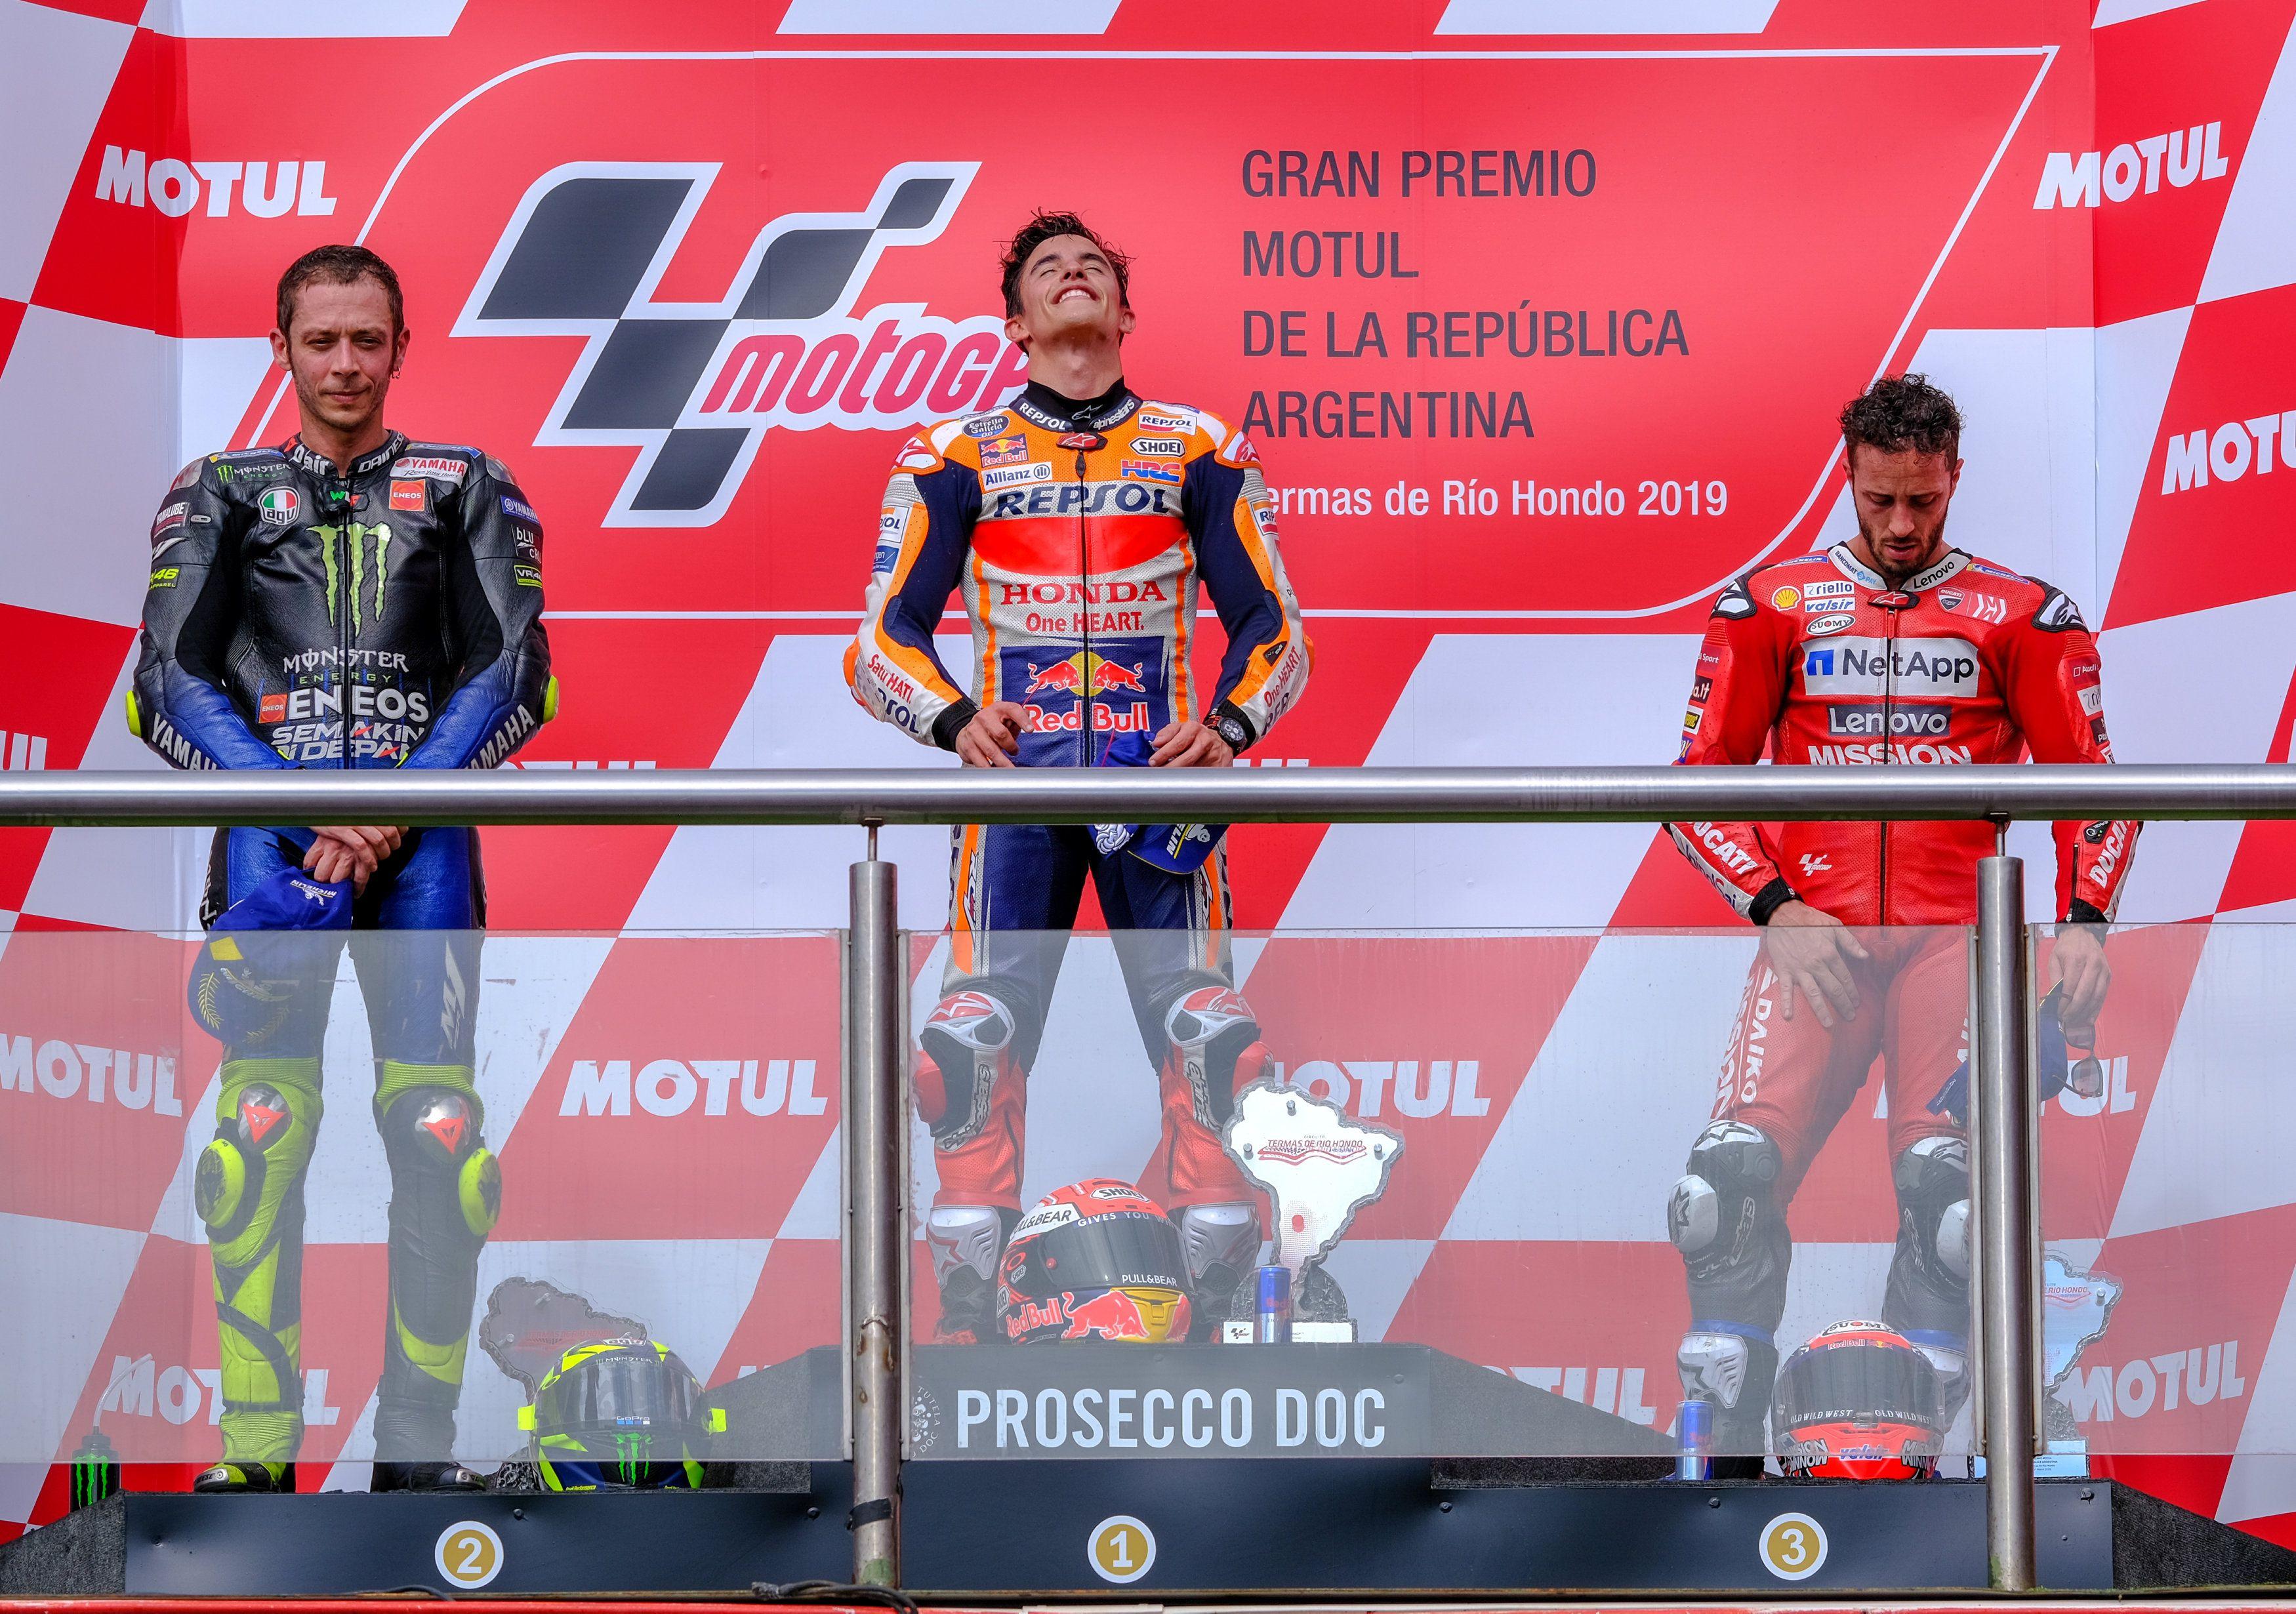 El podio del 2019 con Marc Márquez, Valentino Rossi y Andrea Dovizioso (REUTERS/Rafael Marrodan/Photocall3000)